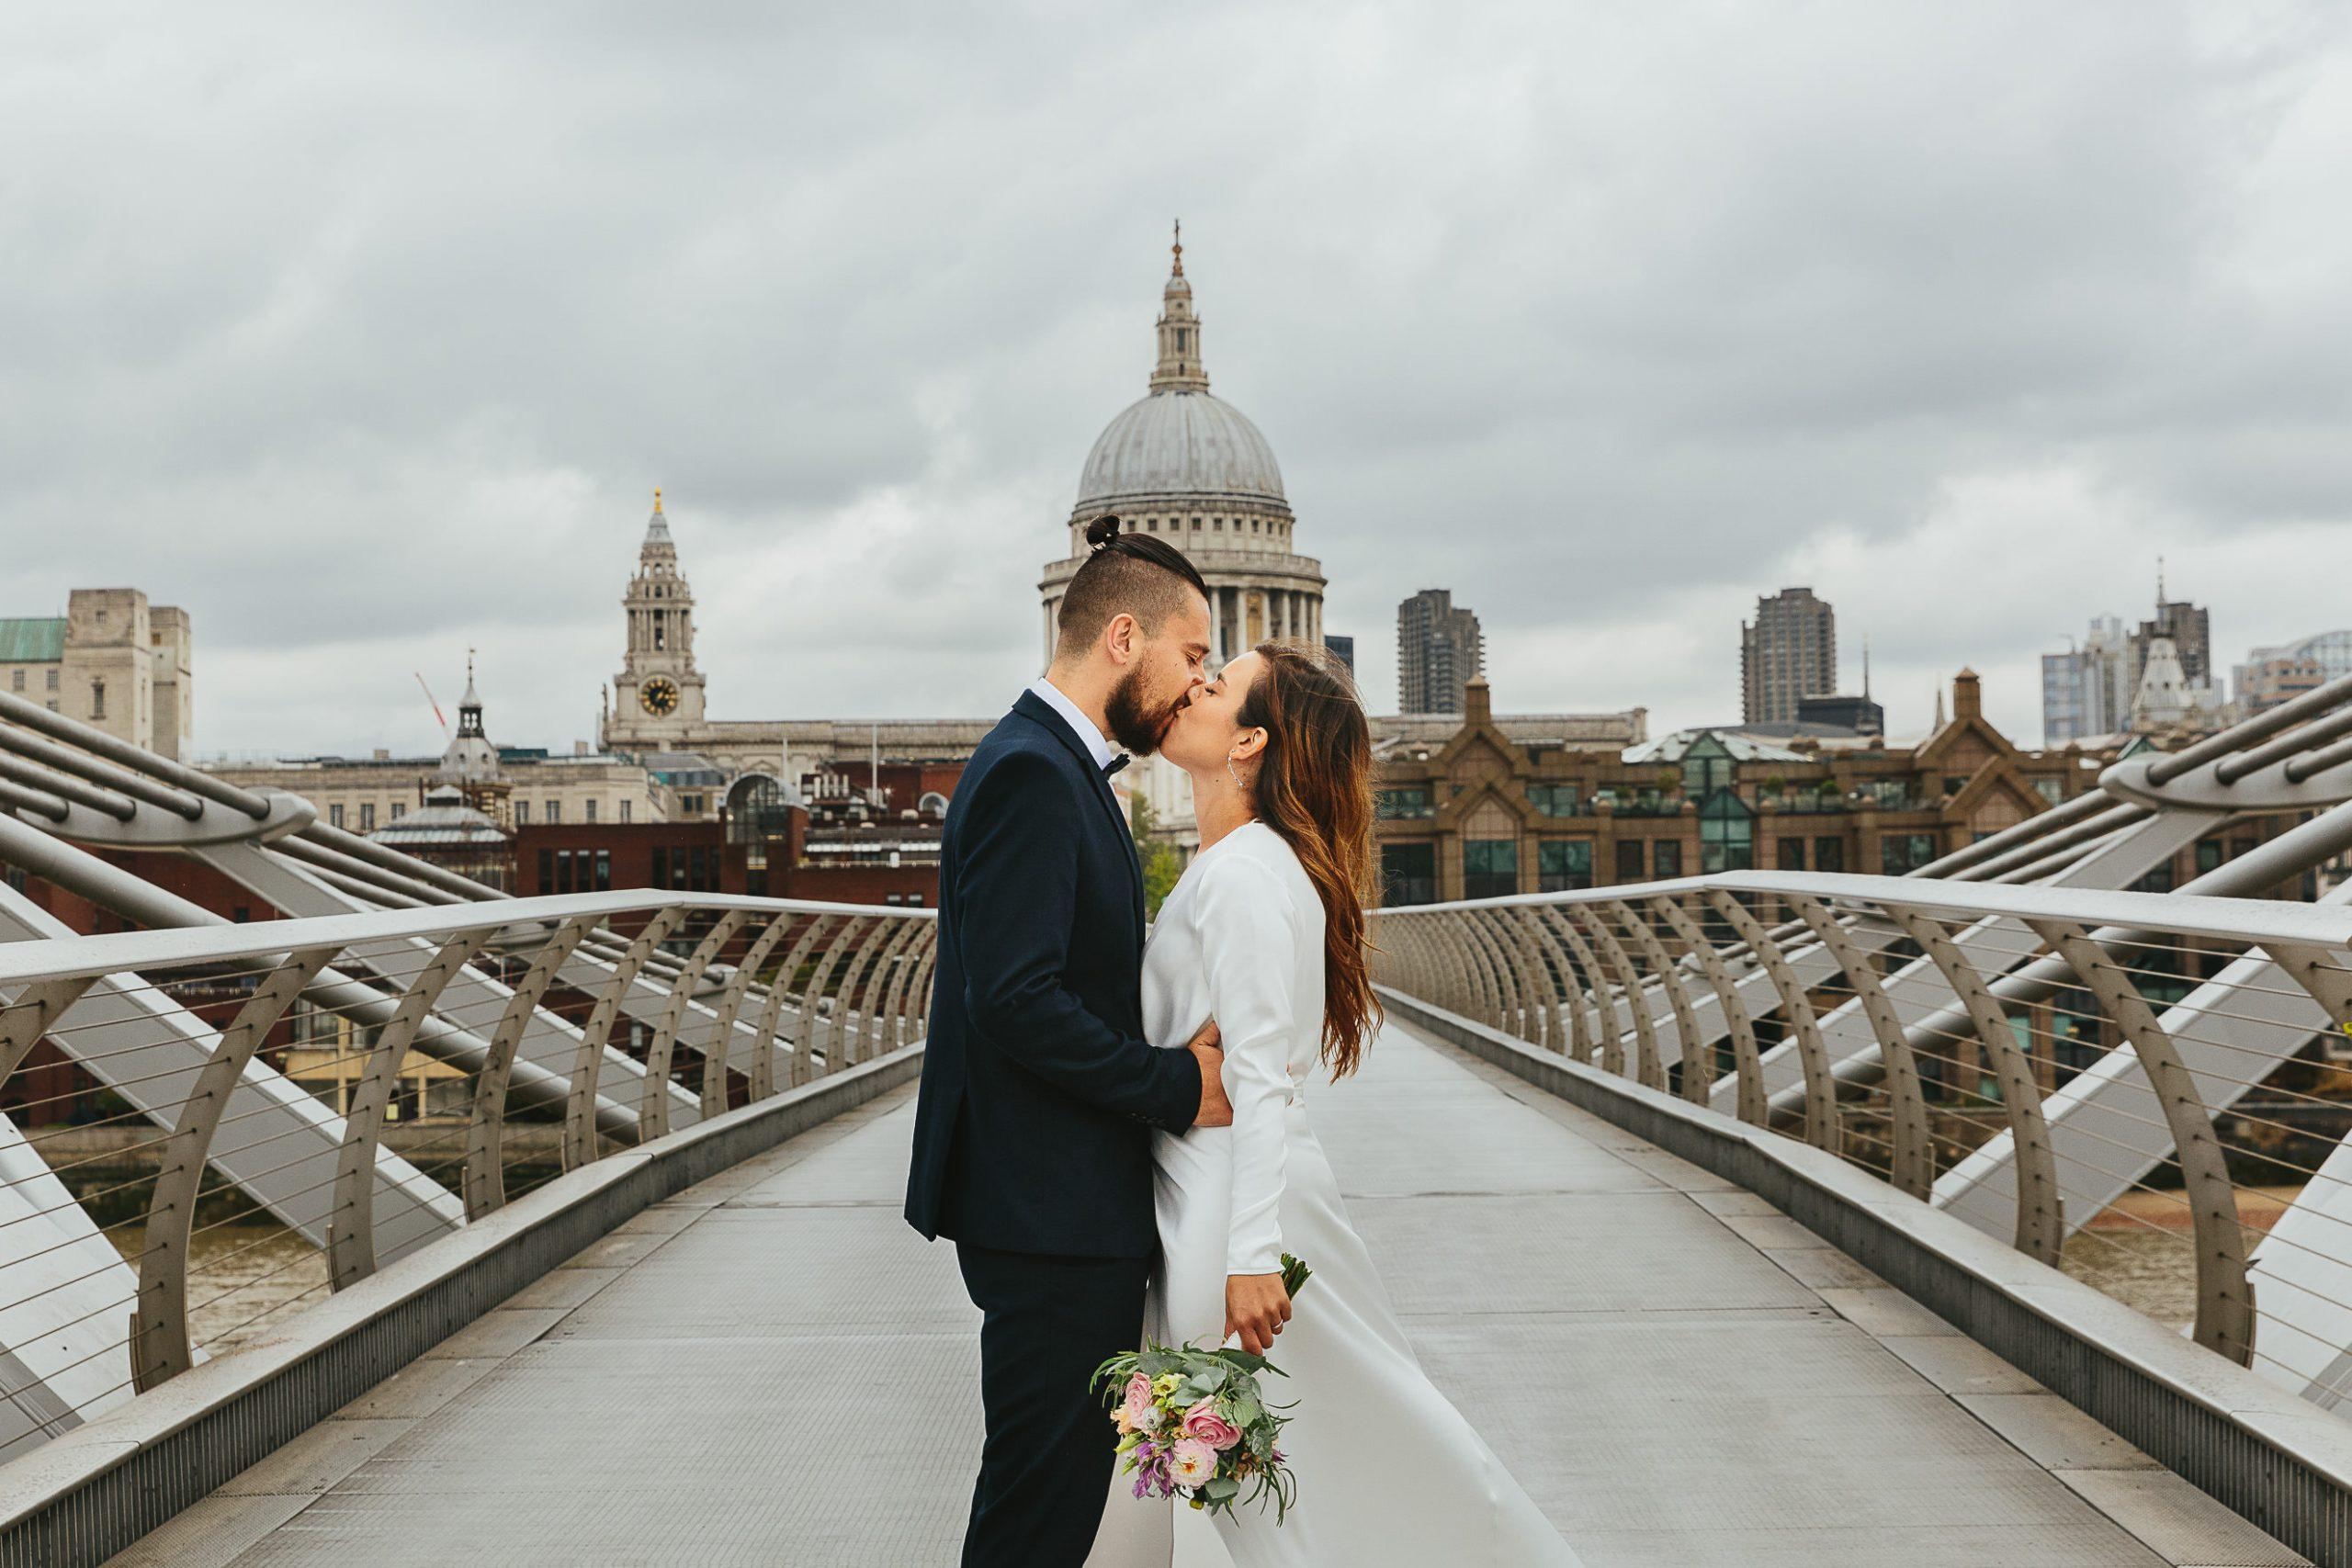 london milennium bridge wedding